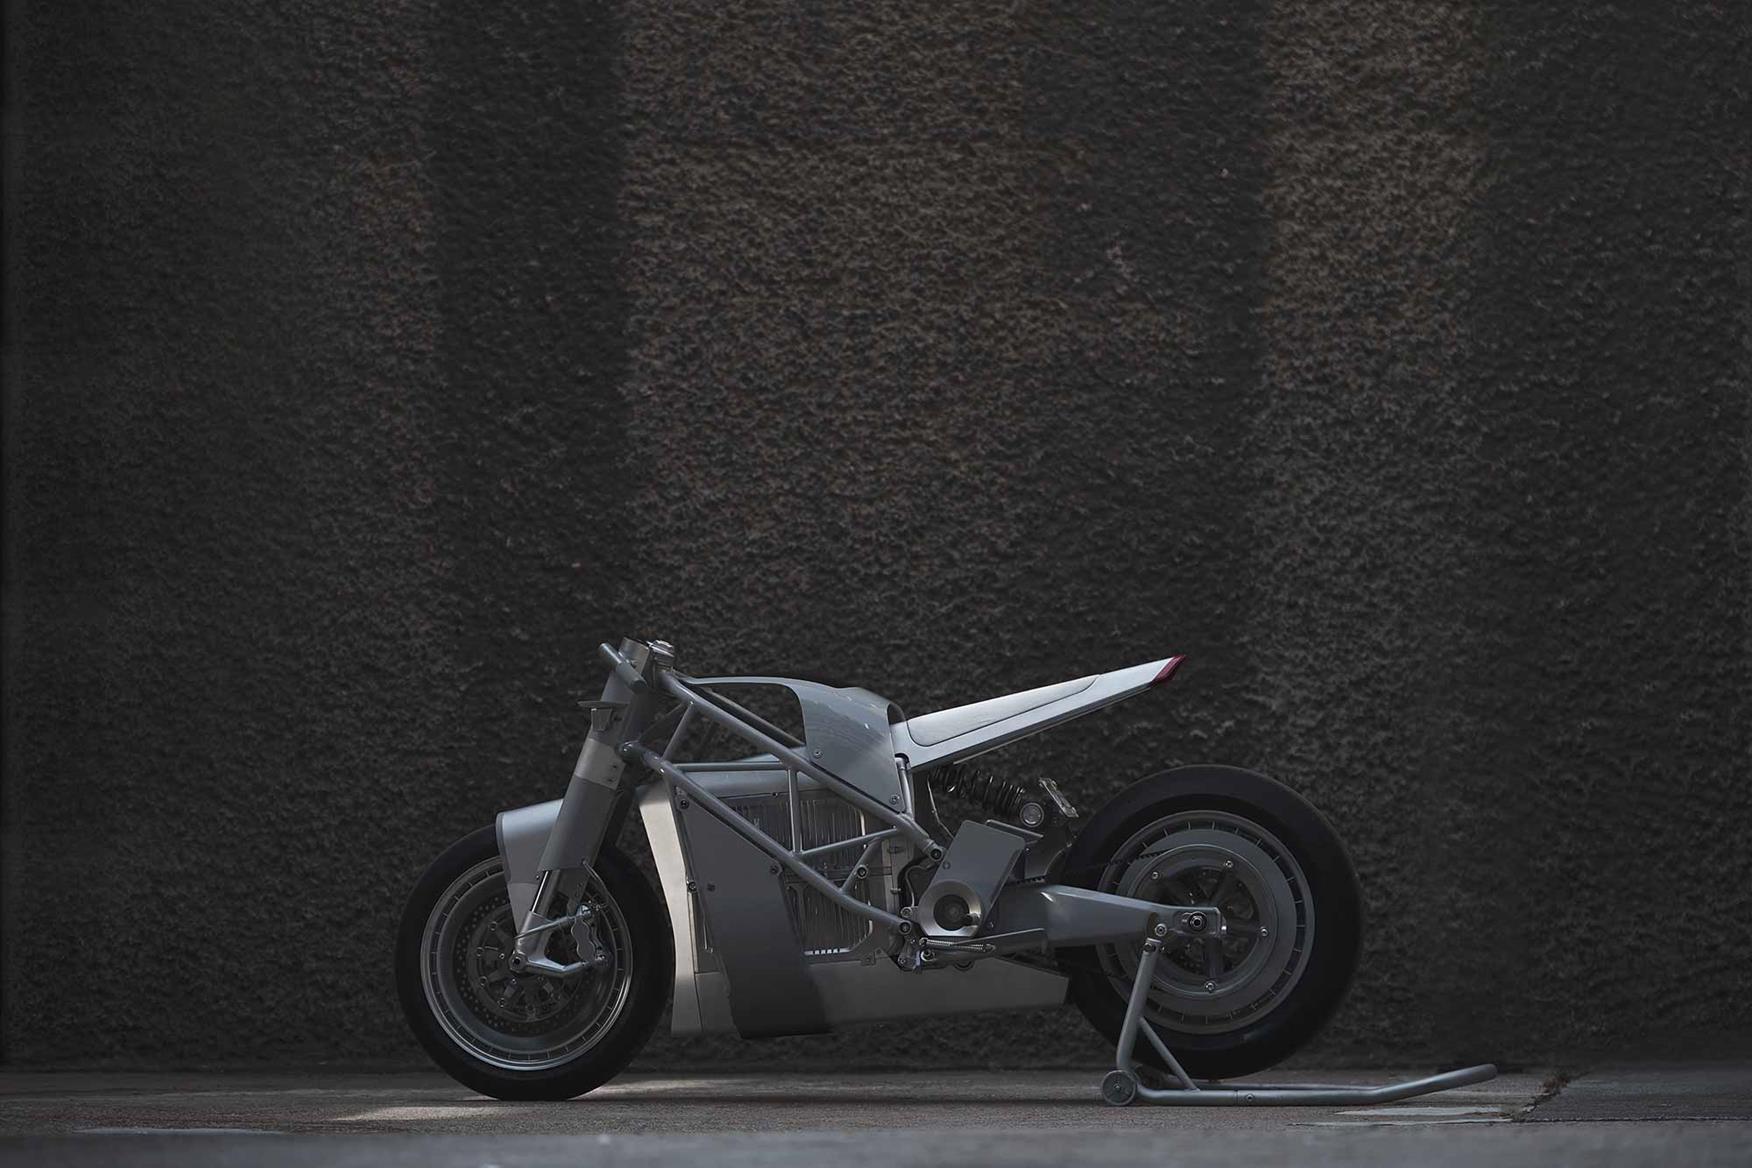 Zero XP bodywork. Credit: Ludovic Robert